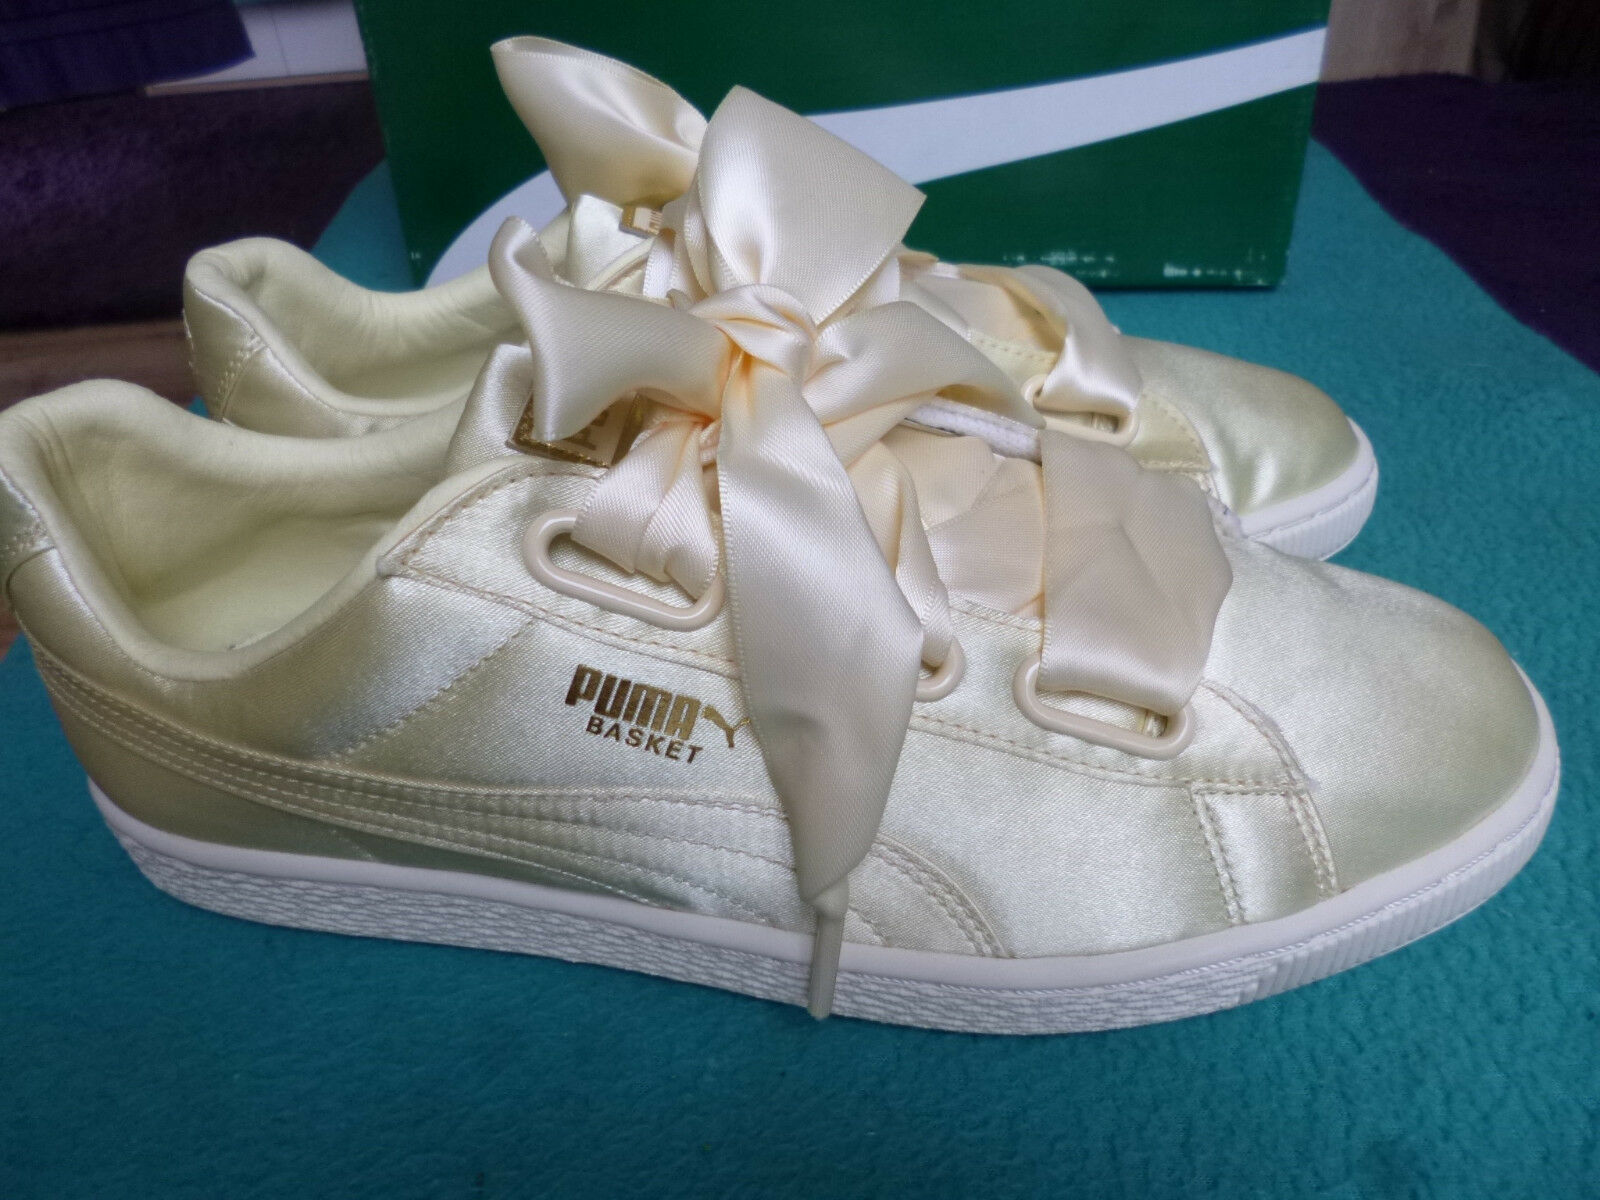 Puma Basket Heart Satin dans teinte jaune d'or-Taille 37-top Chaussures Femmes Basket-Neuf